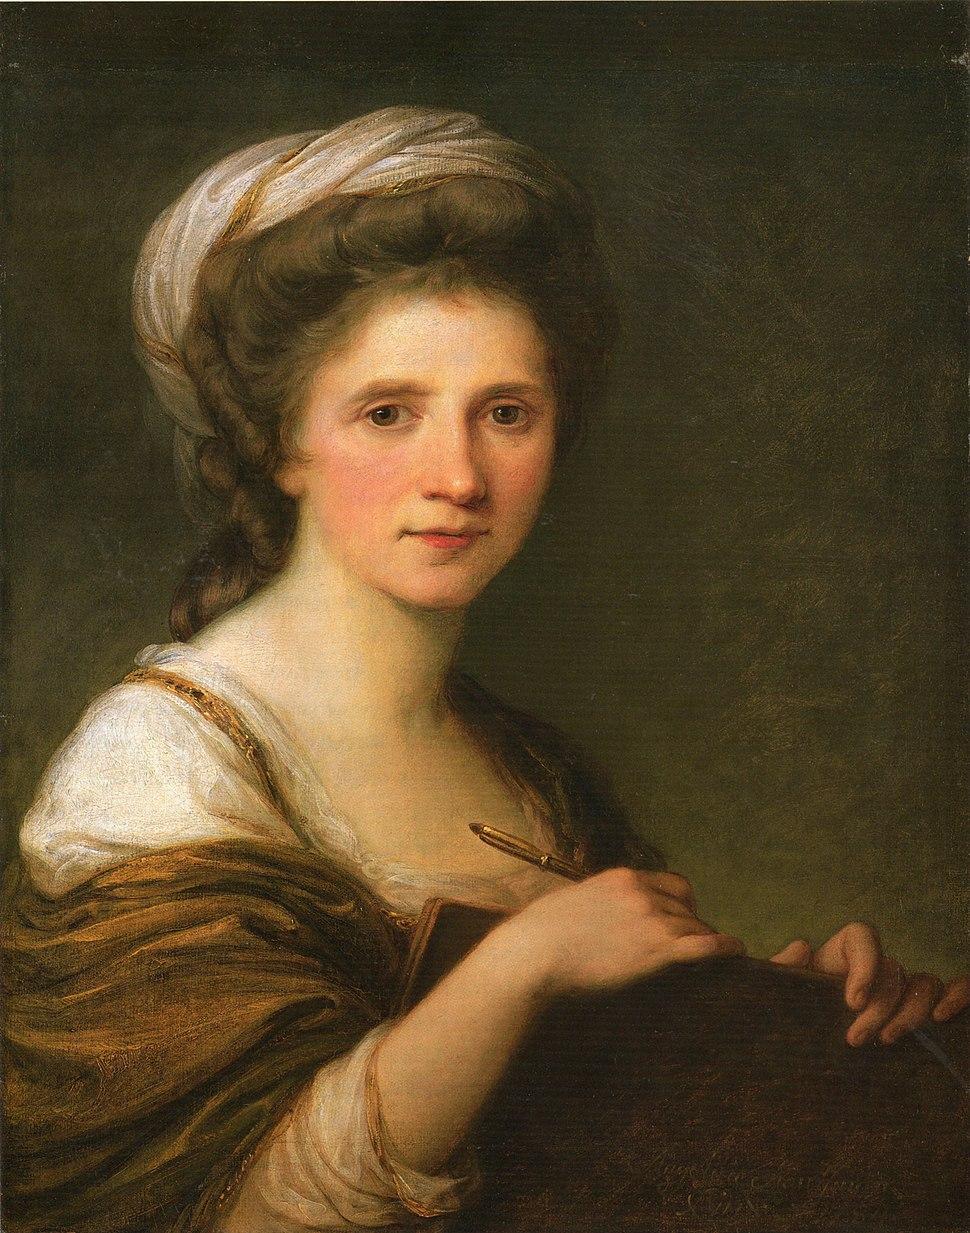 Angelika Kauffmann - Self Portrait - 1784